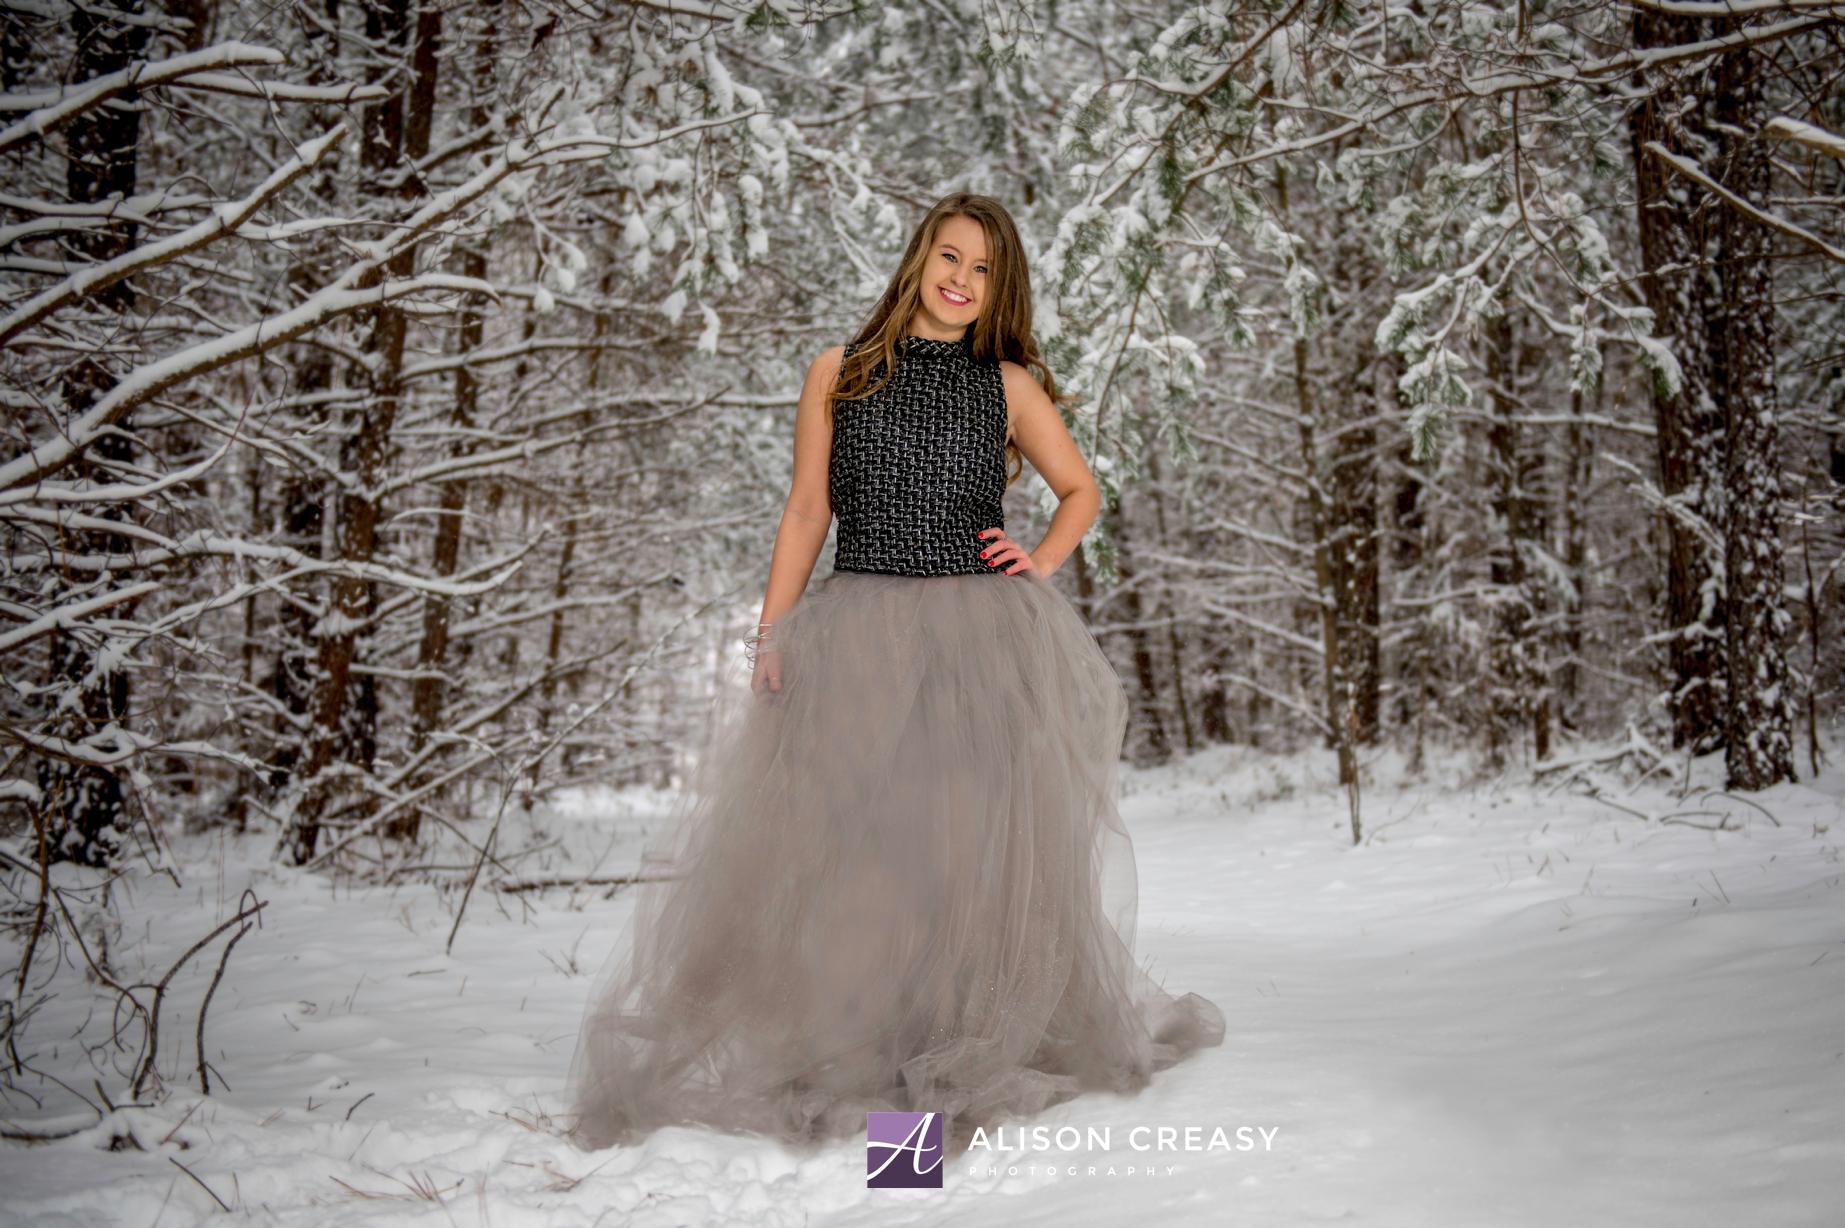 Alison-Creasy-Photography-Lynchburg-VA-Senior-Photographer_0018.jpg